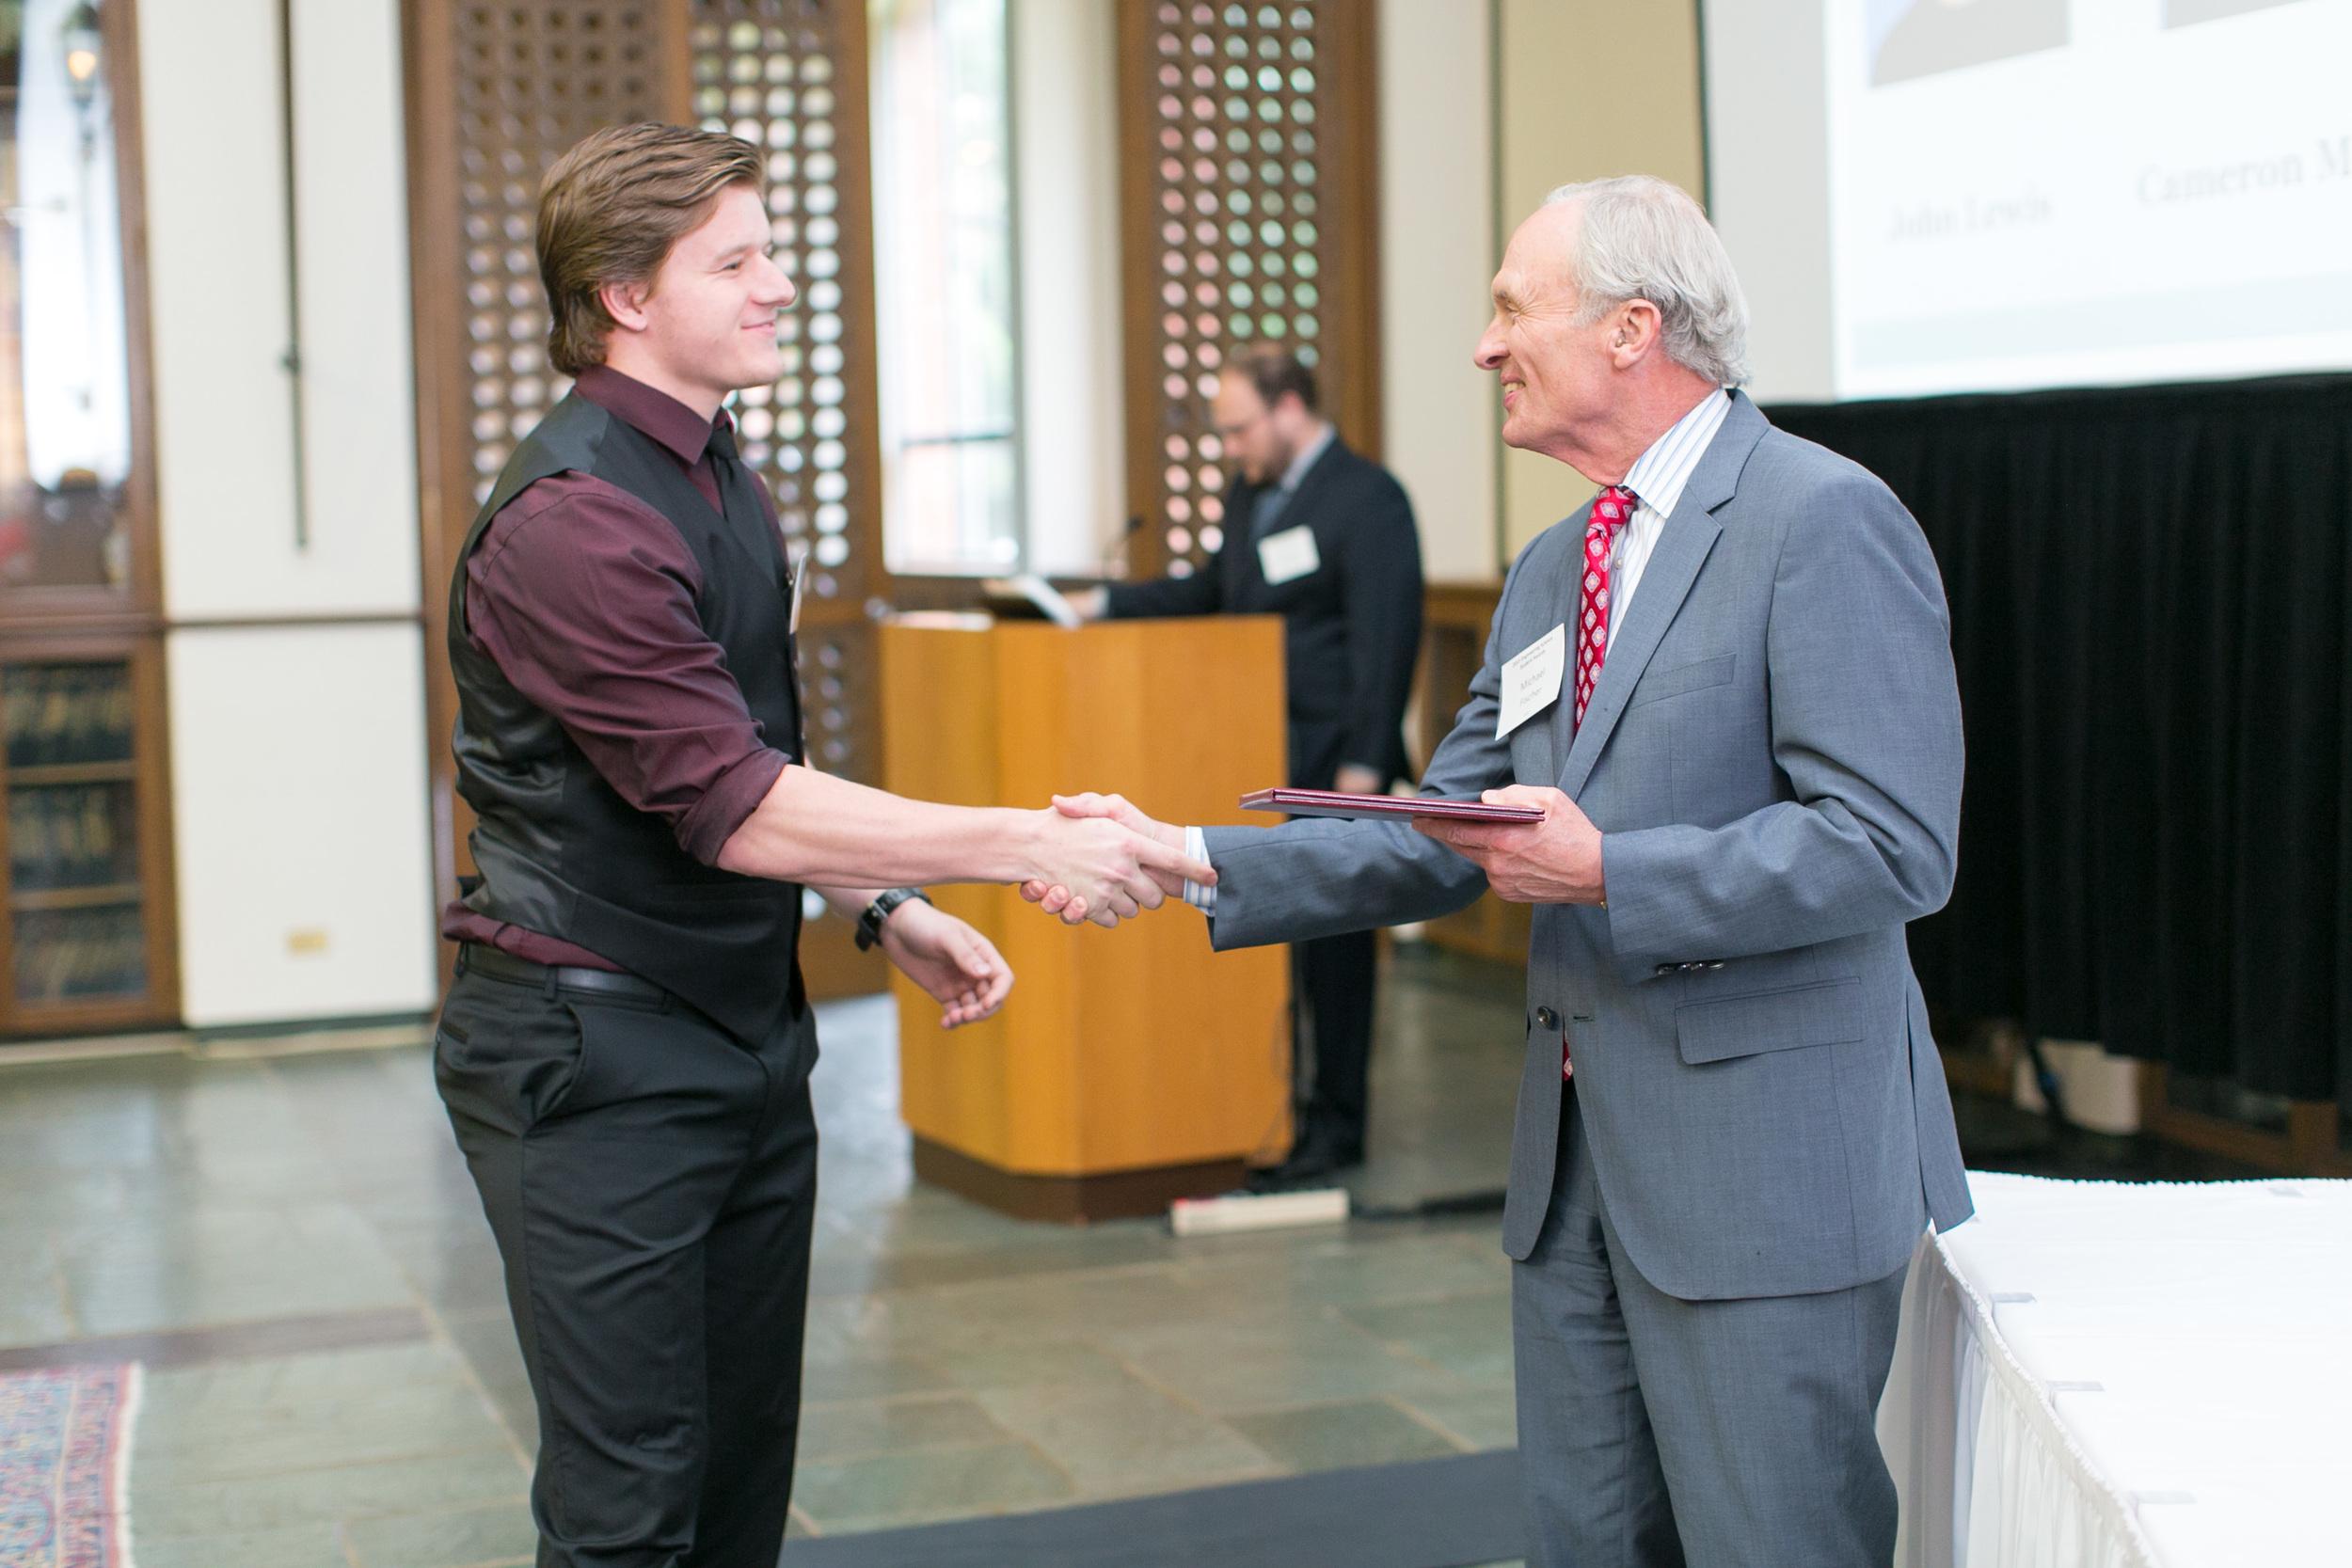 073-Engineering Awards.jpg